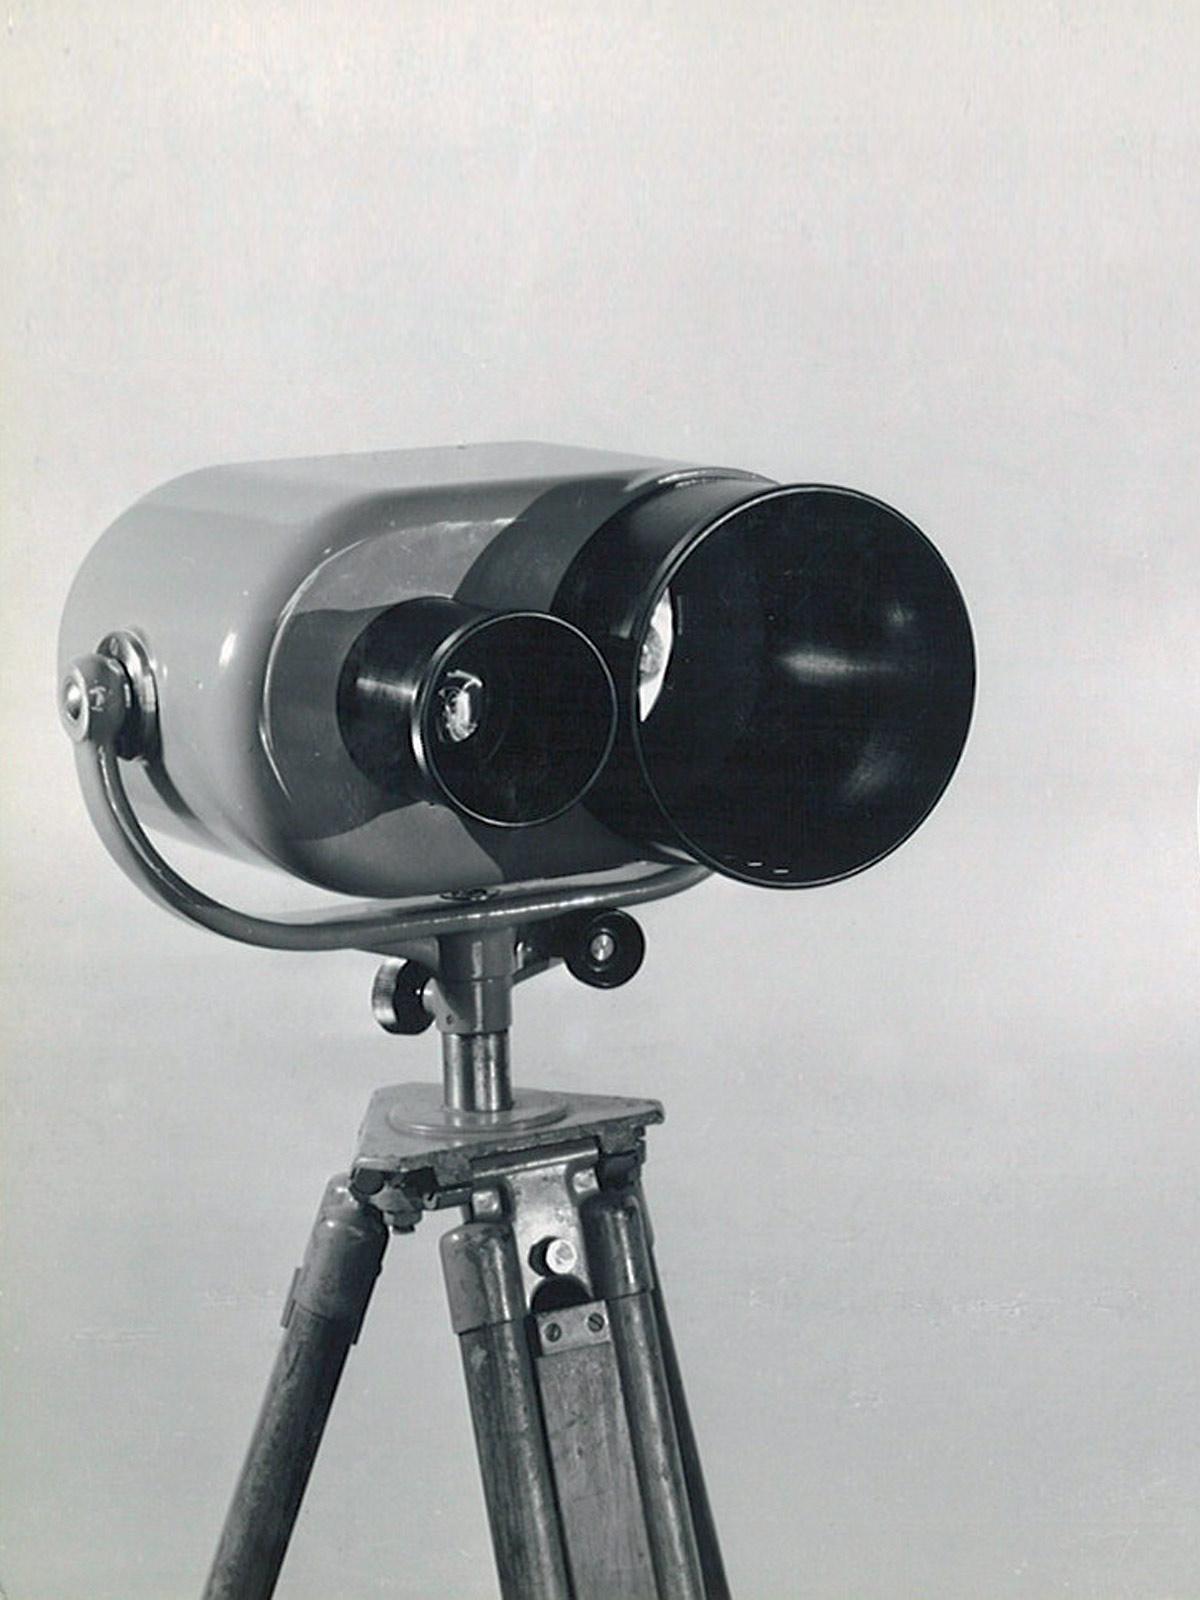 Kliknite za sliku za veću verziju  Ime:olympics_1948_photoelectric_1200x1600_large.jpg Viđeno:484 Veličina:220,5 KB ID:130398